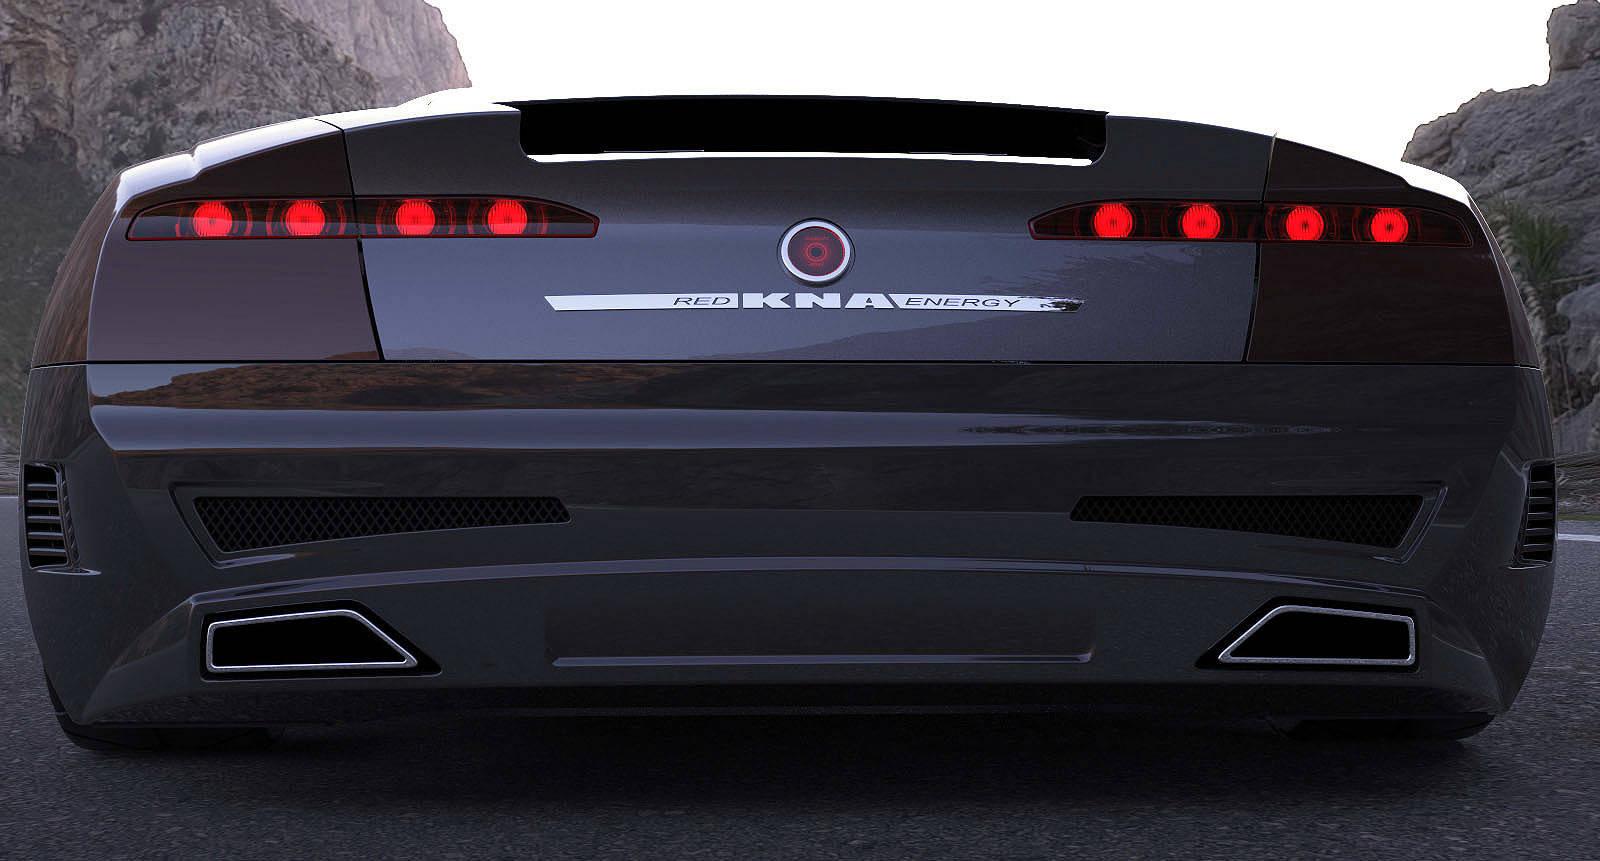 Desert-R KNA concept car